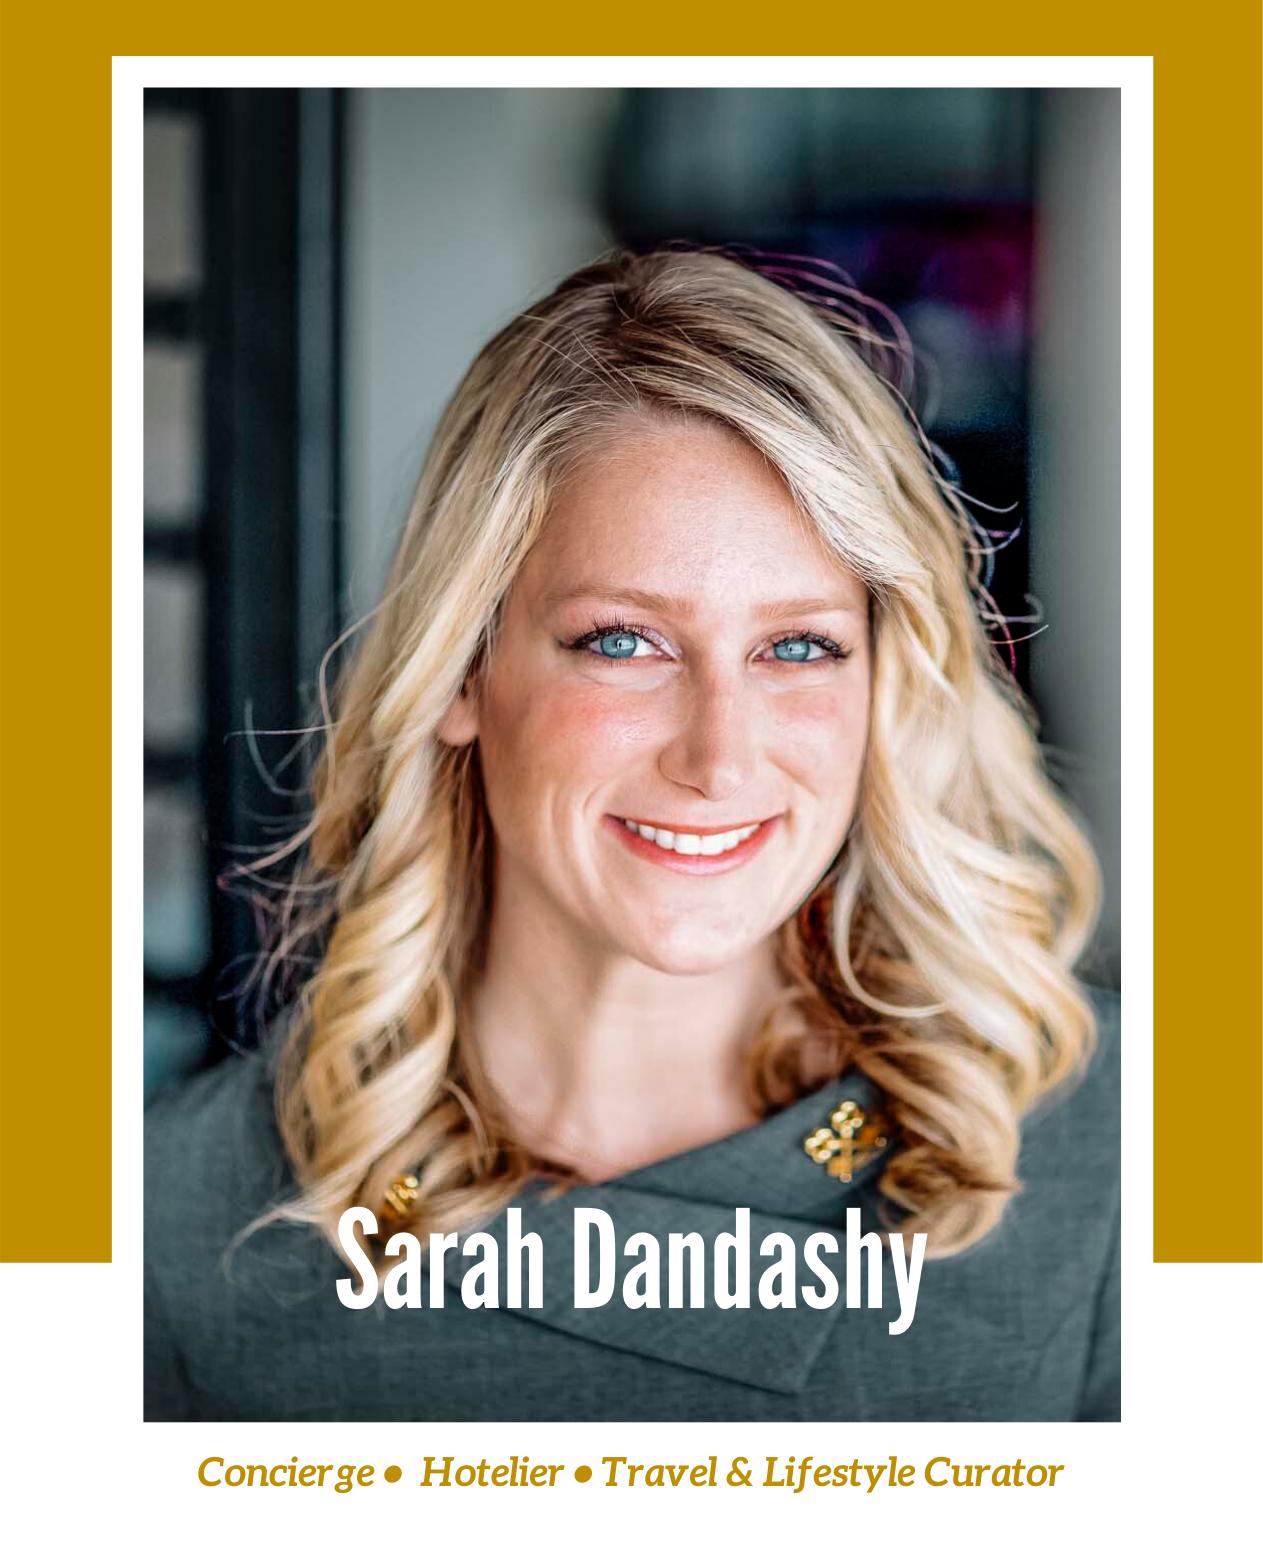 Rachel Off Duty: Stories Beyond the 9 to 5 - Episode 3 - Sarah Dandashy